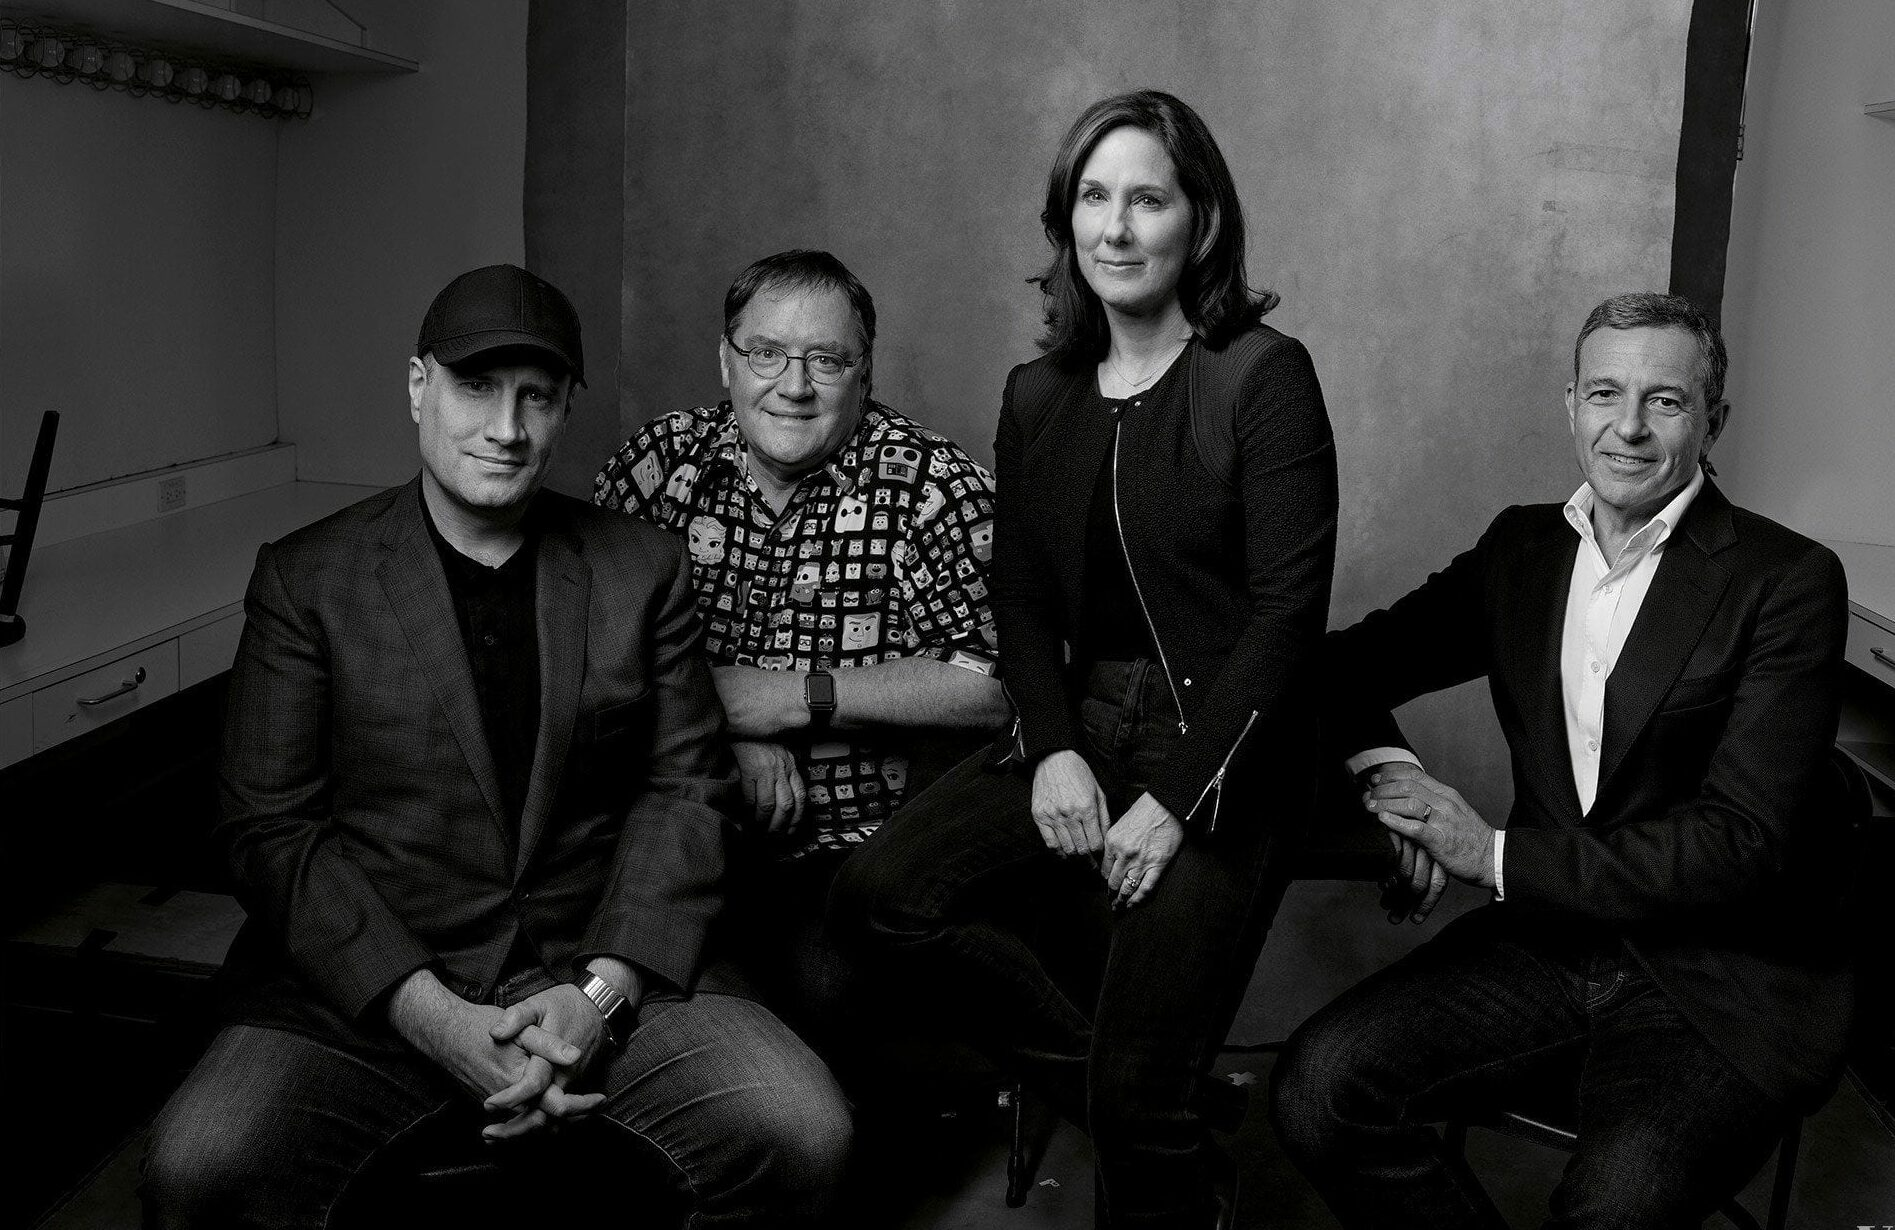 Kevin Feige, Kathleen Kennedy, Bob Iger